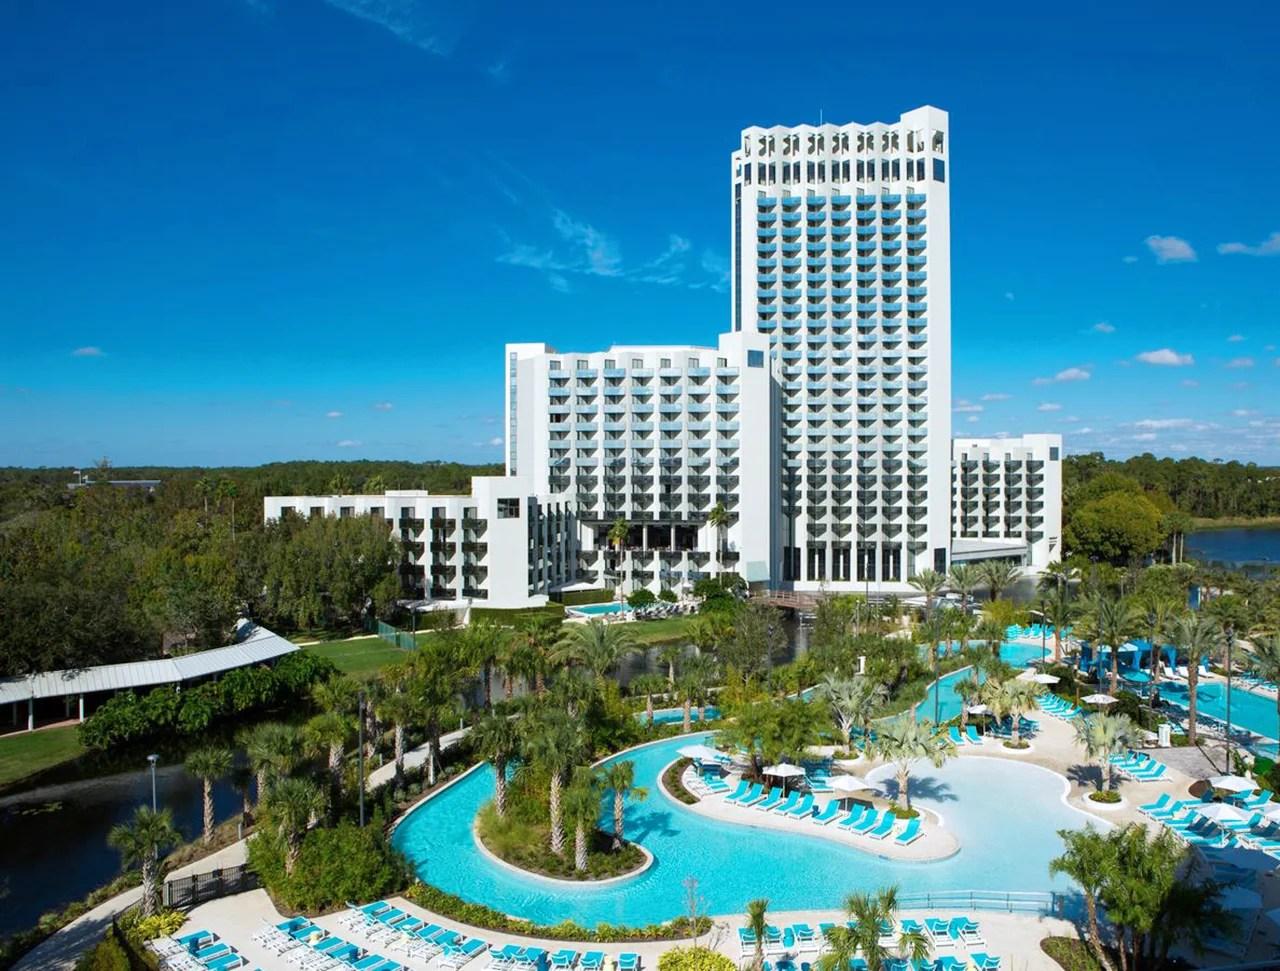 The Hilton Orlando Buena Vista Palace. (Photo courtey of Hilton Orlando Buena Vista Palace)